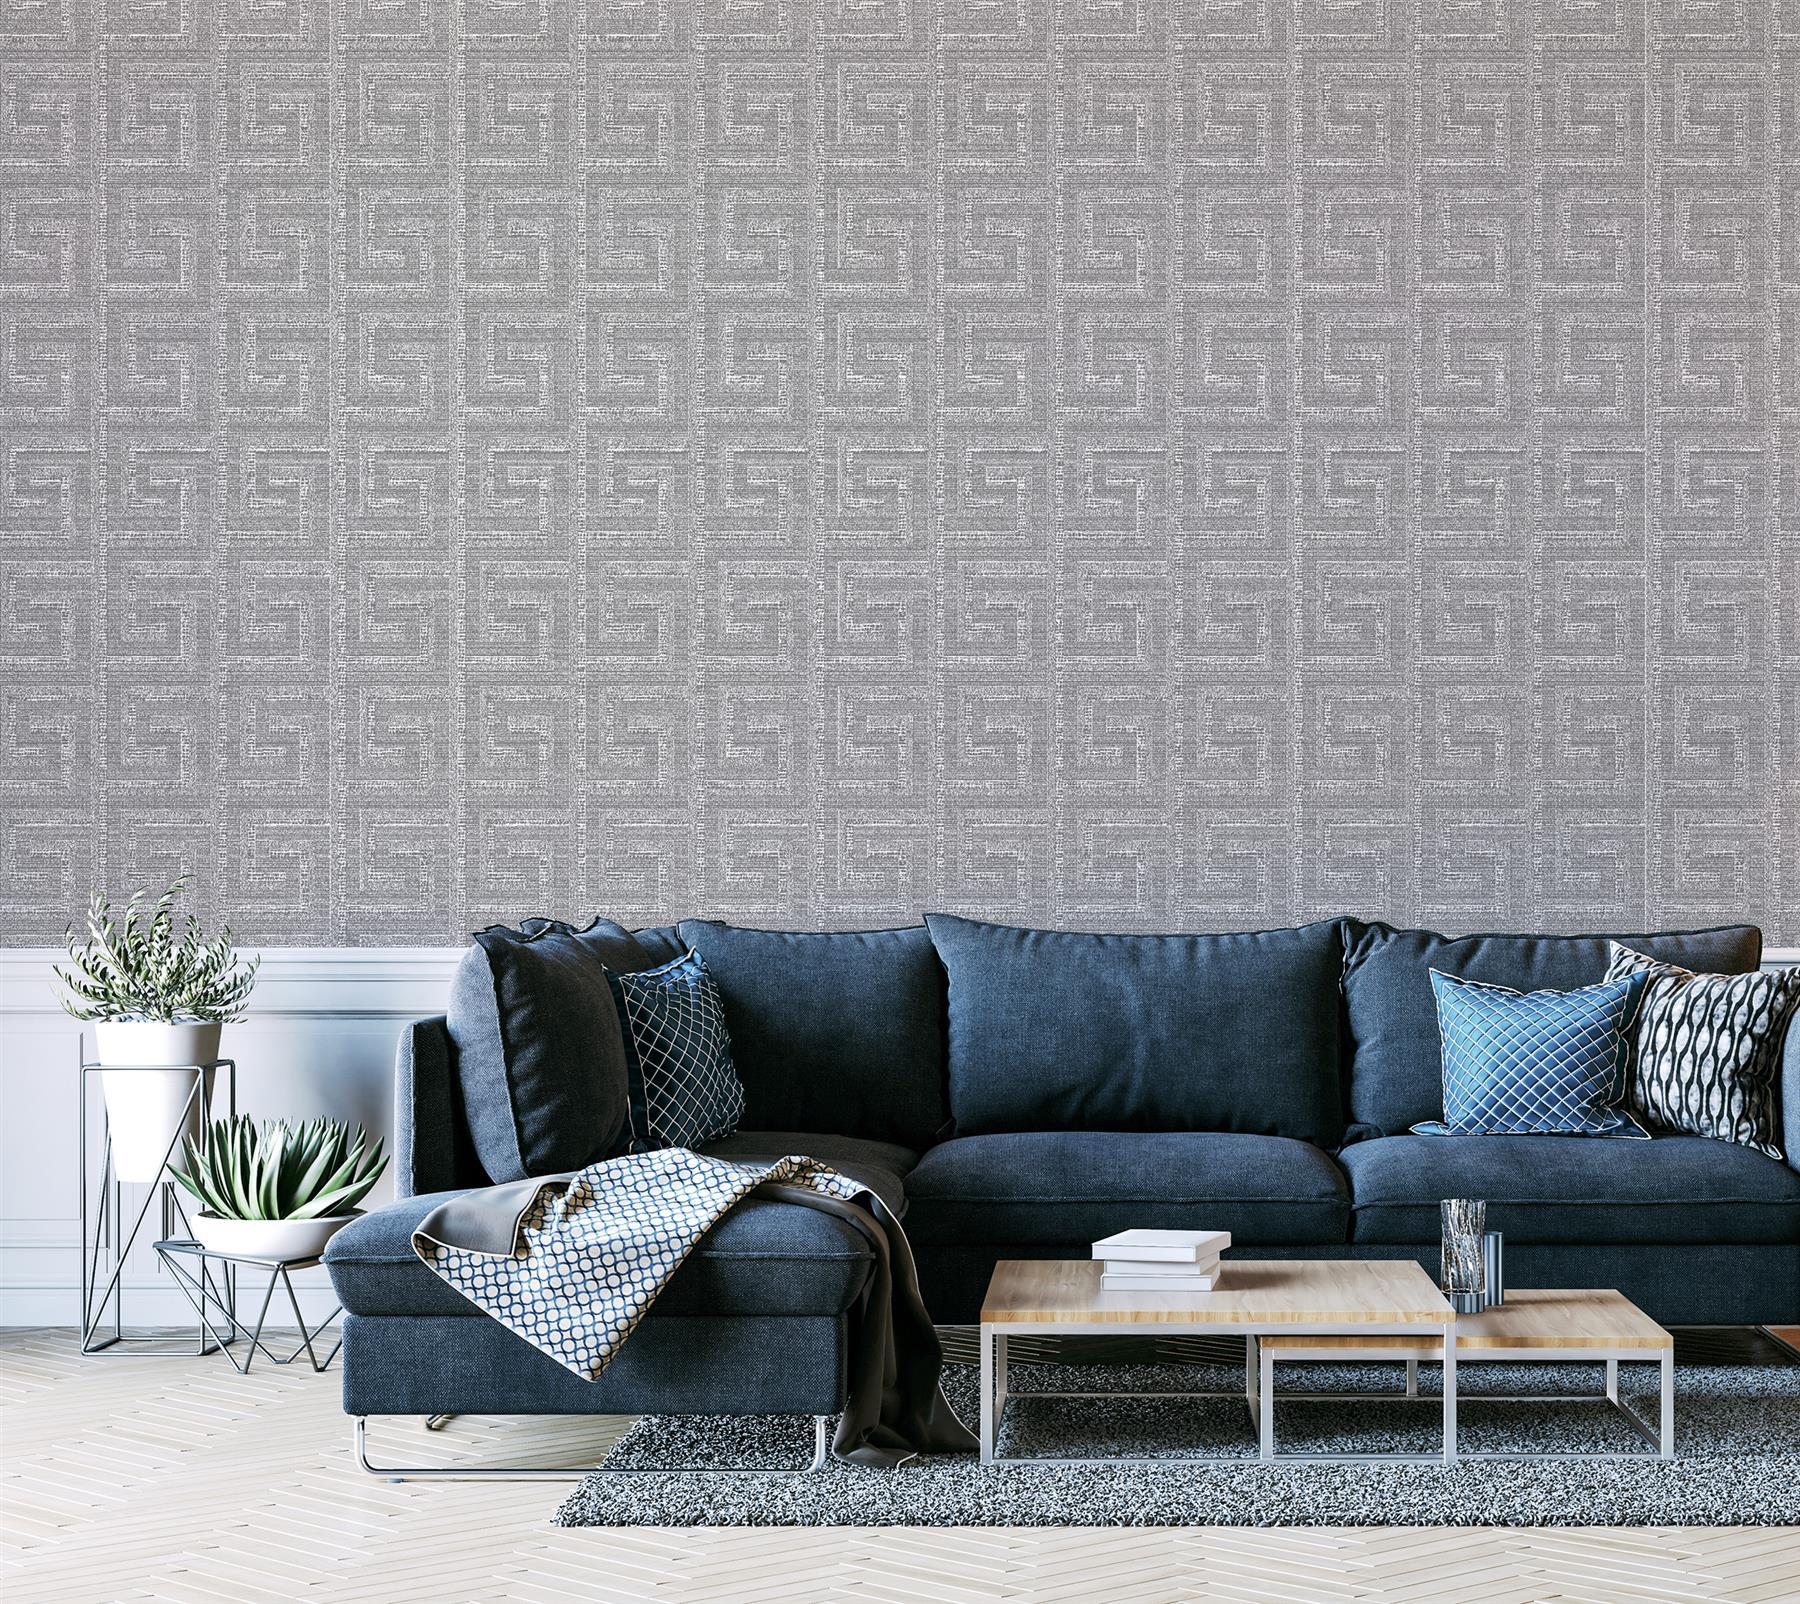 Arthouse-Greek-Key-Luxury-Foil-Shimmer-Metallic-Textured-Wallpaper thumbnail 5